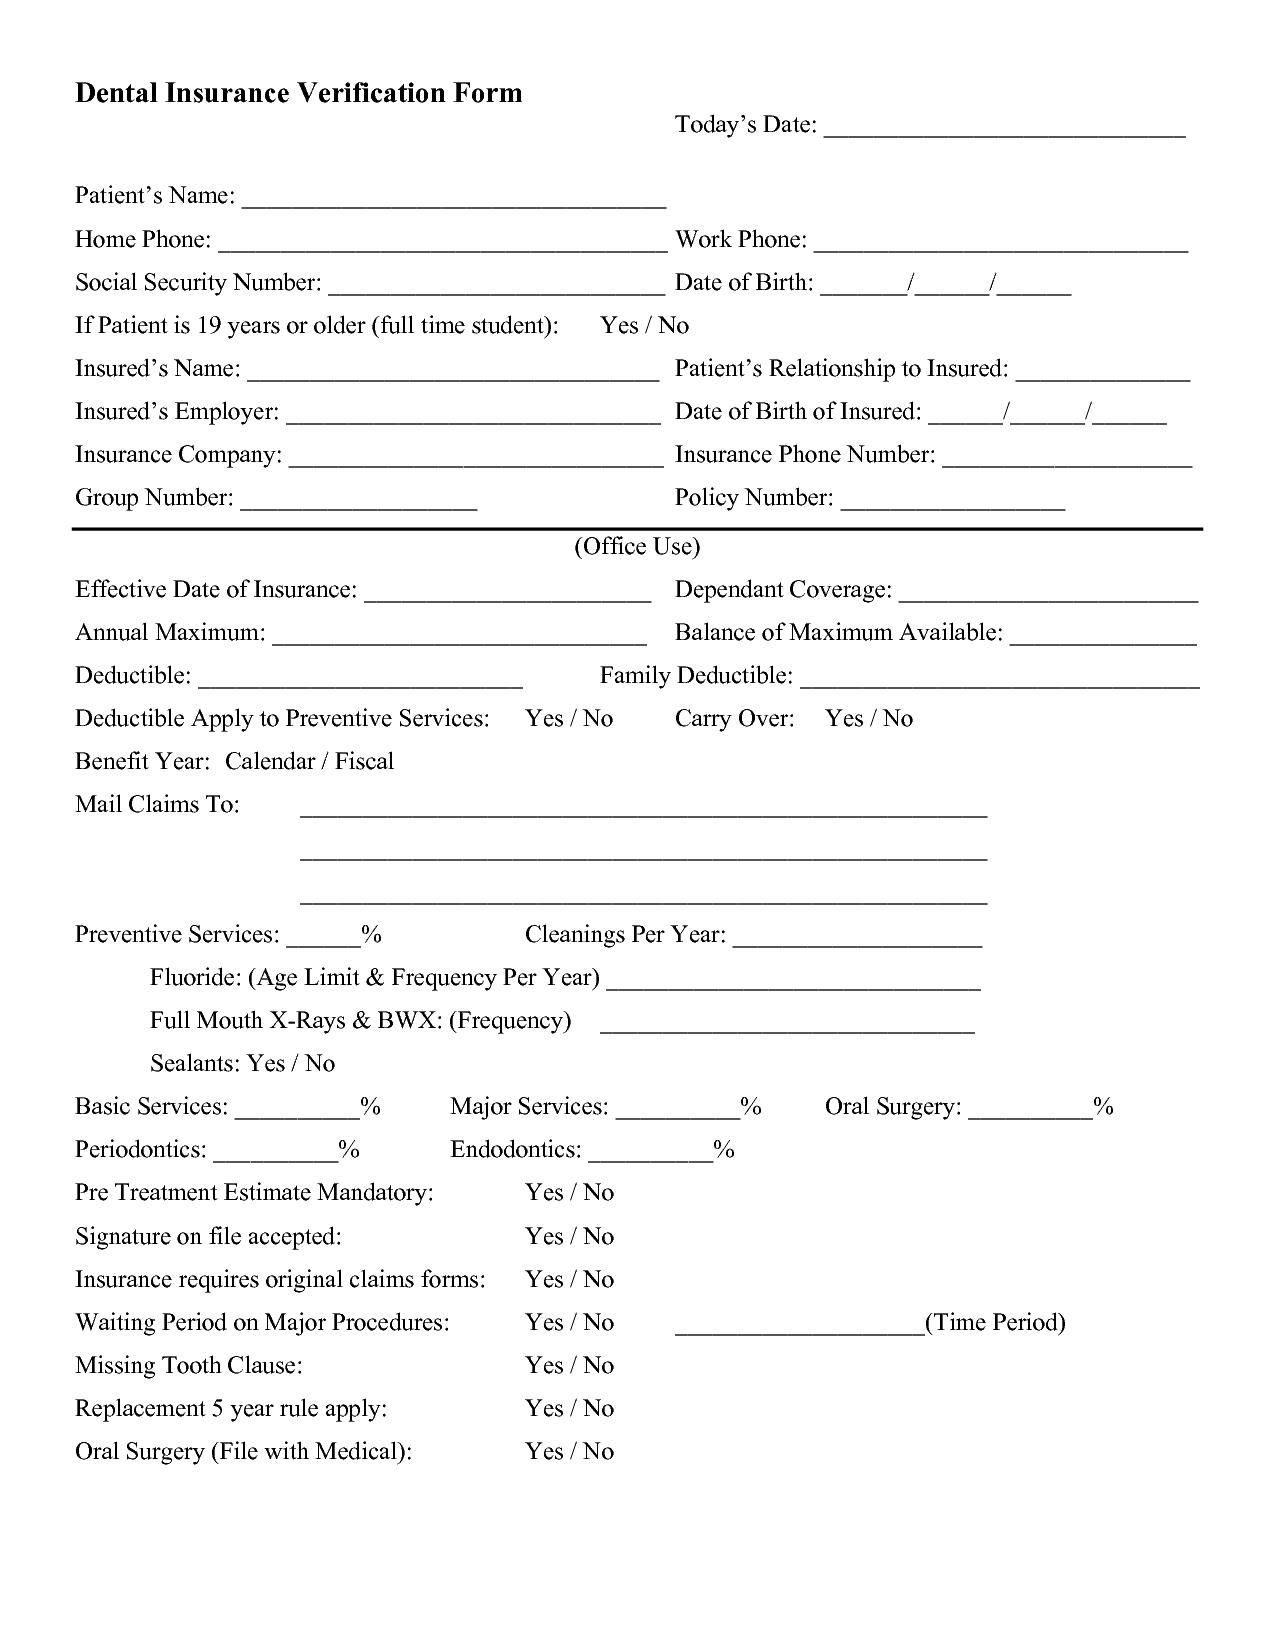 Dental Insurance Verification Forms Dental Insurance